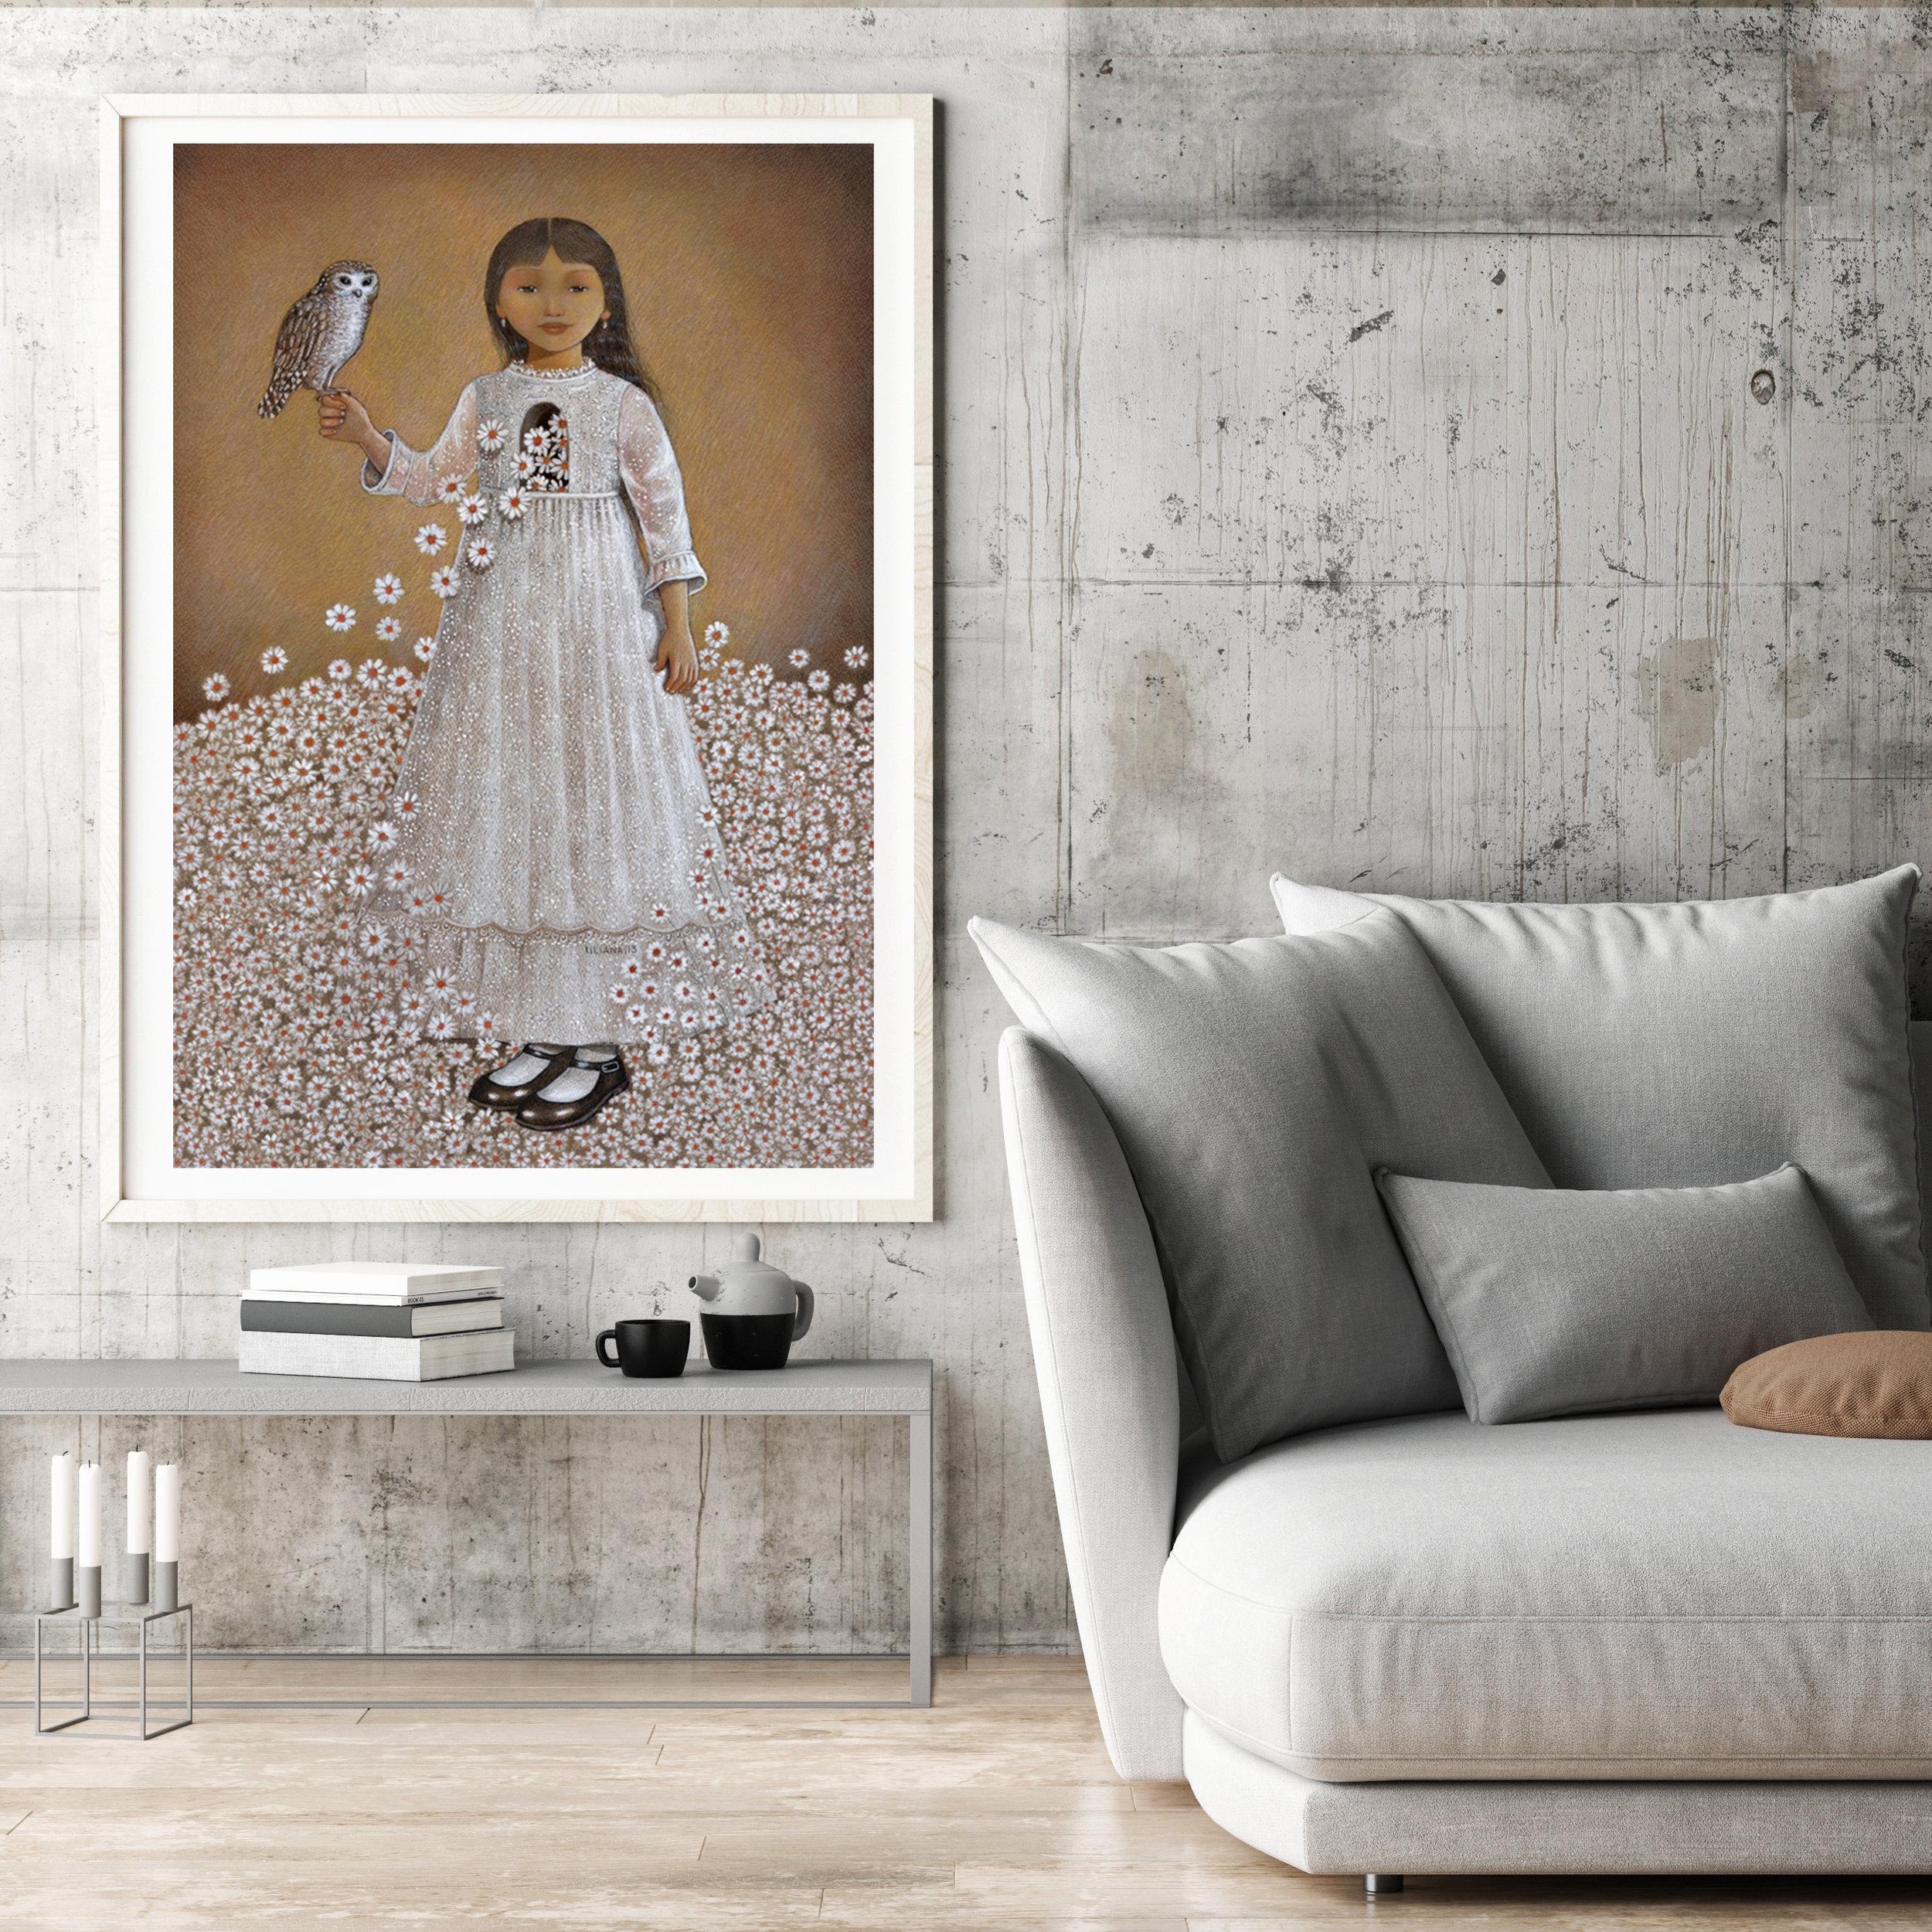 Framed poster in hipster living room, 3d illustration